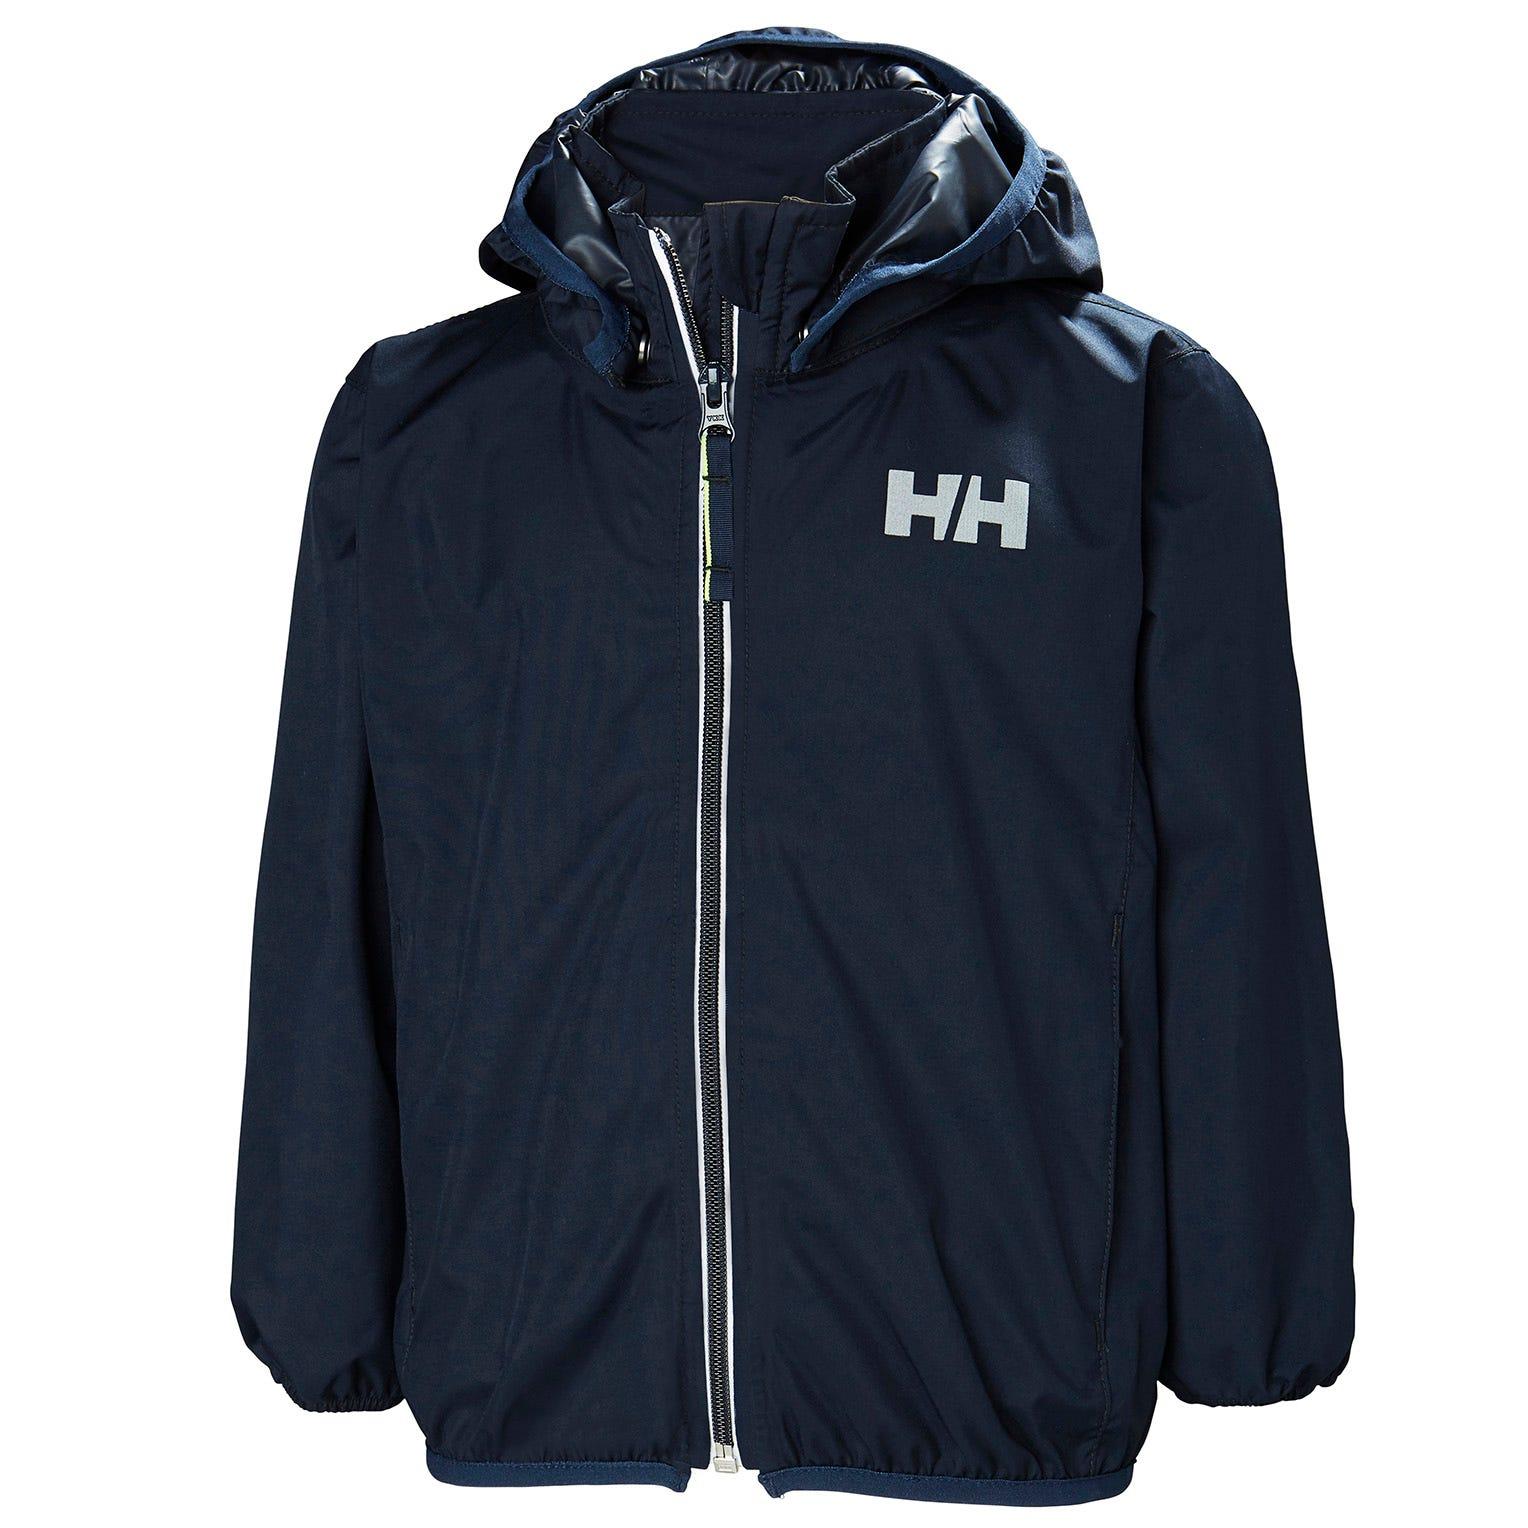 Helly Hansen Kids Helium Packable Jacket Parka Navy 92/2